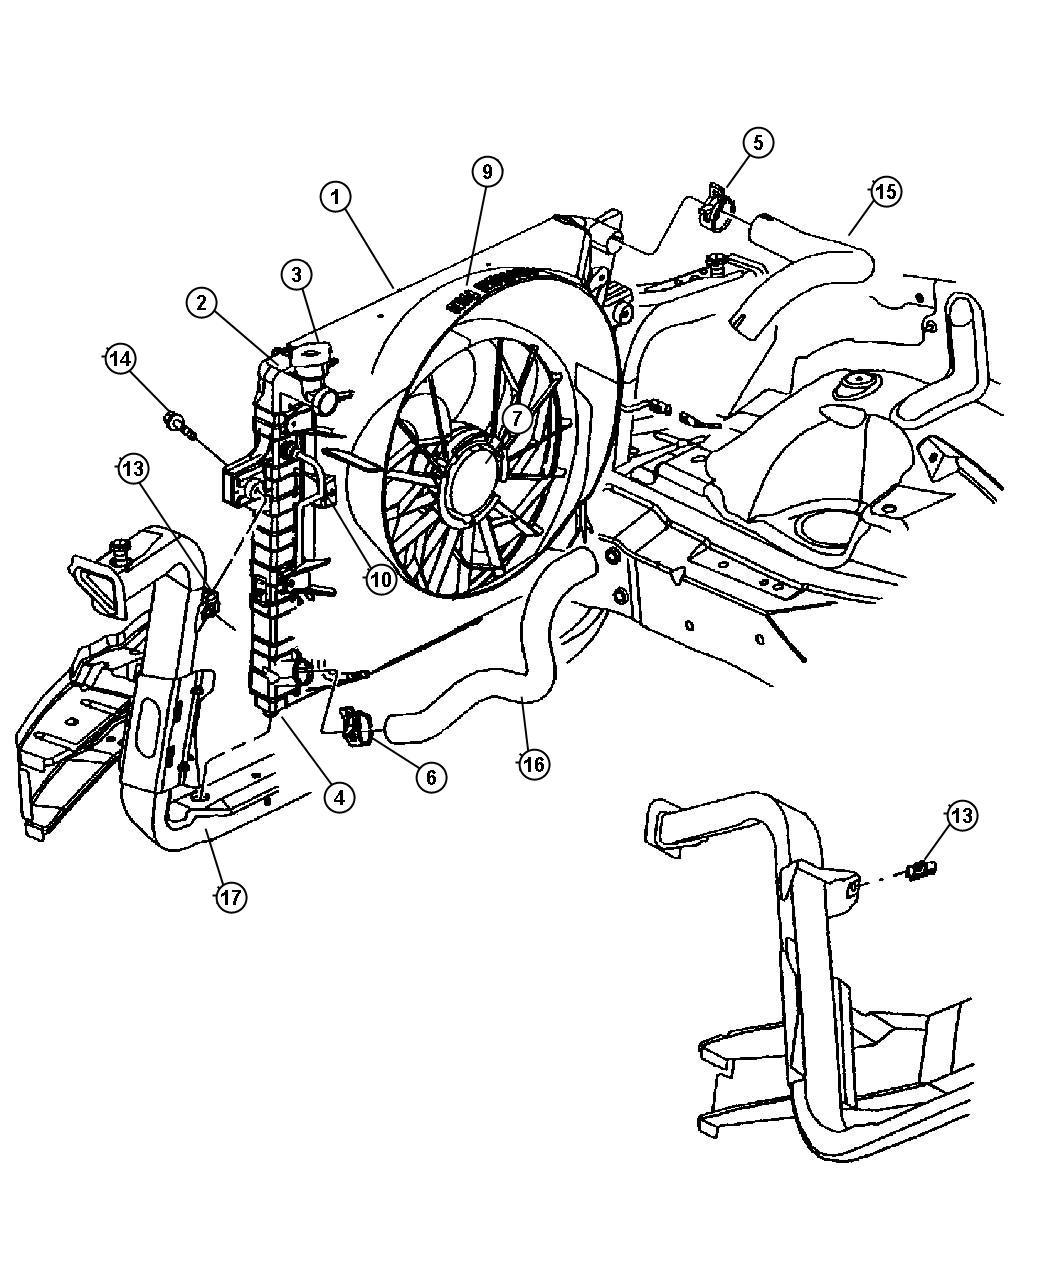 Jeep Wrangler Part Diagram